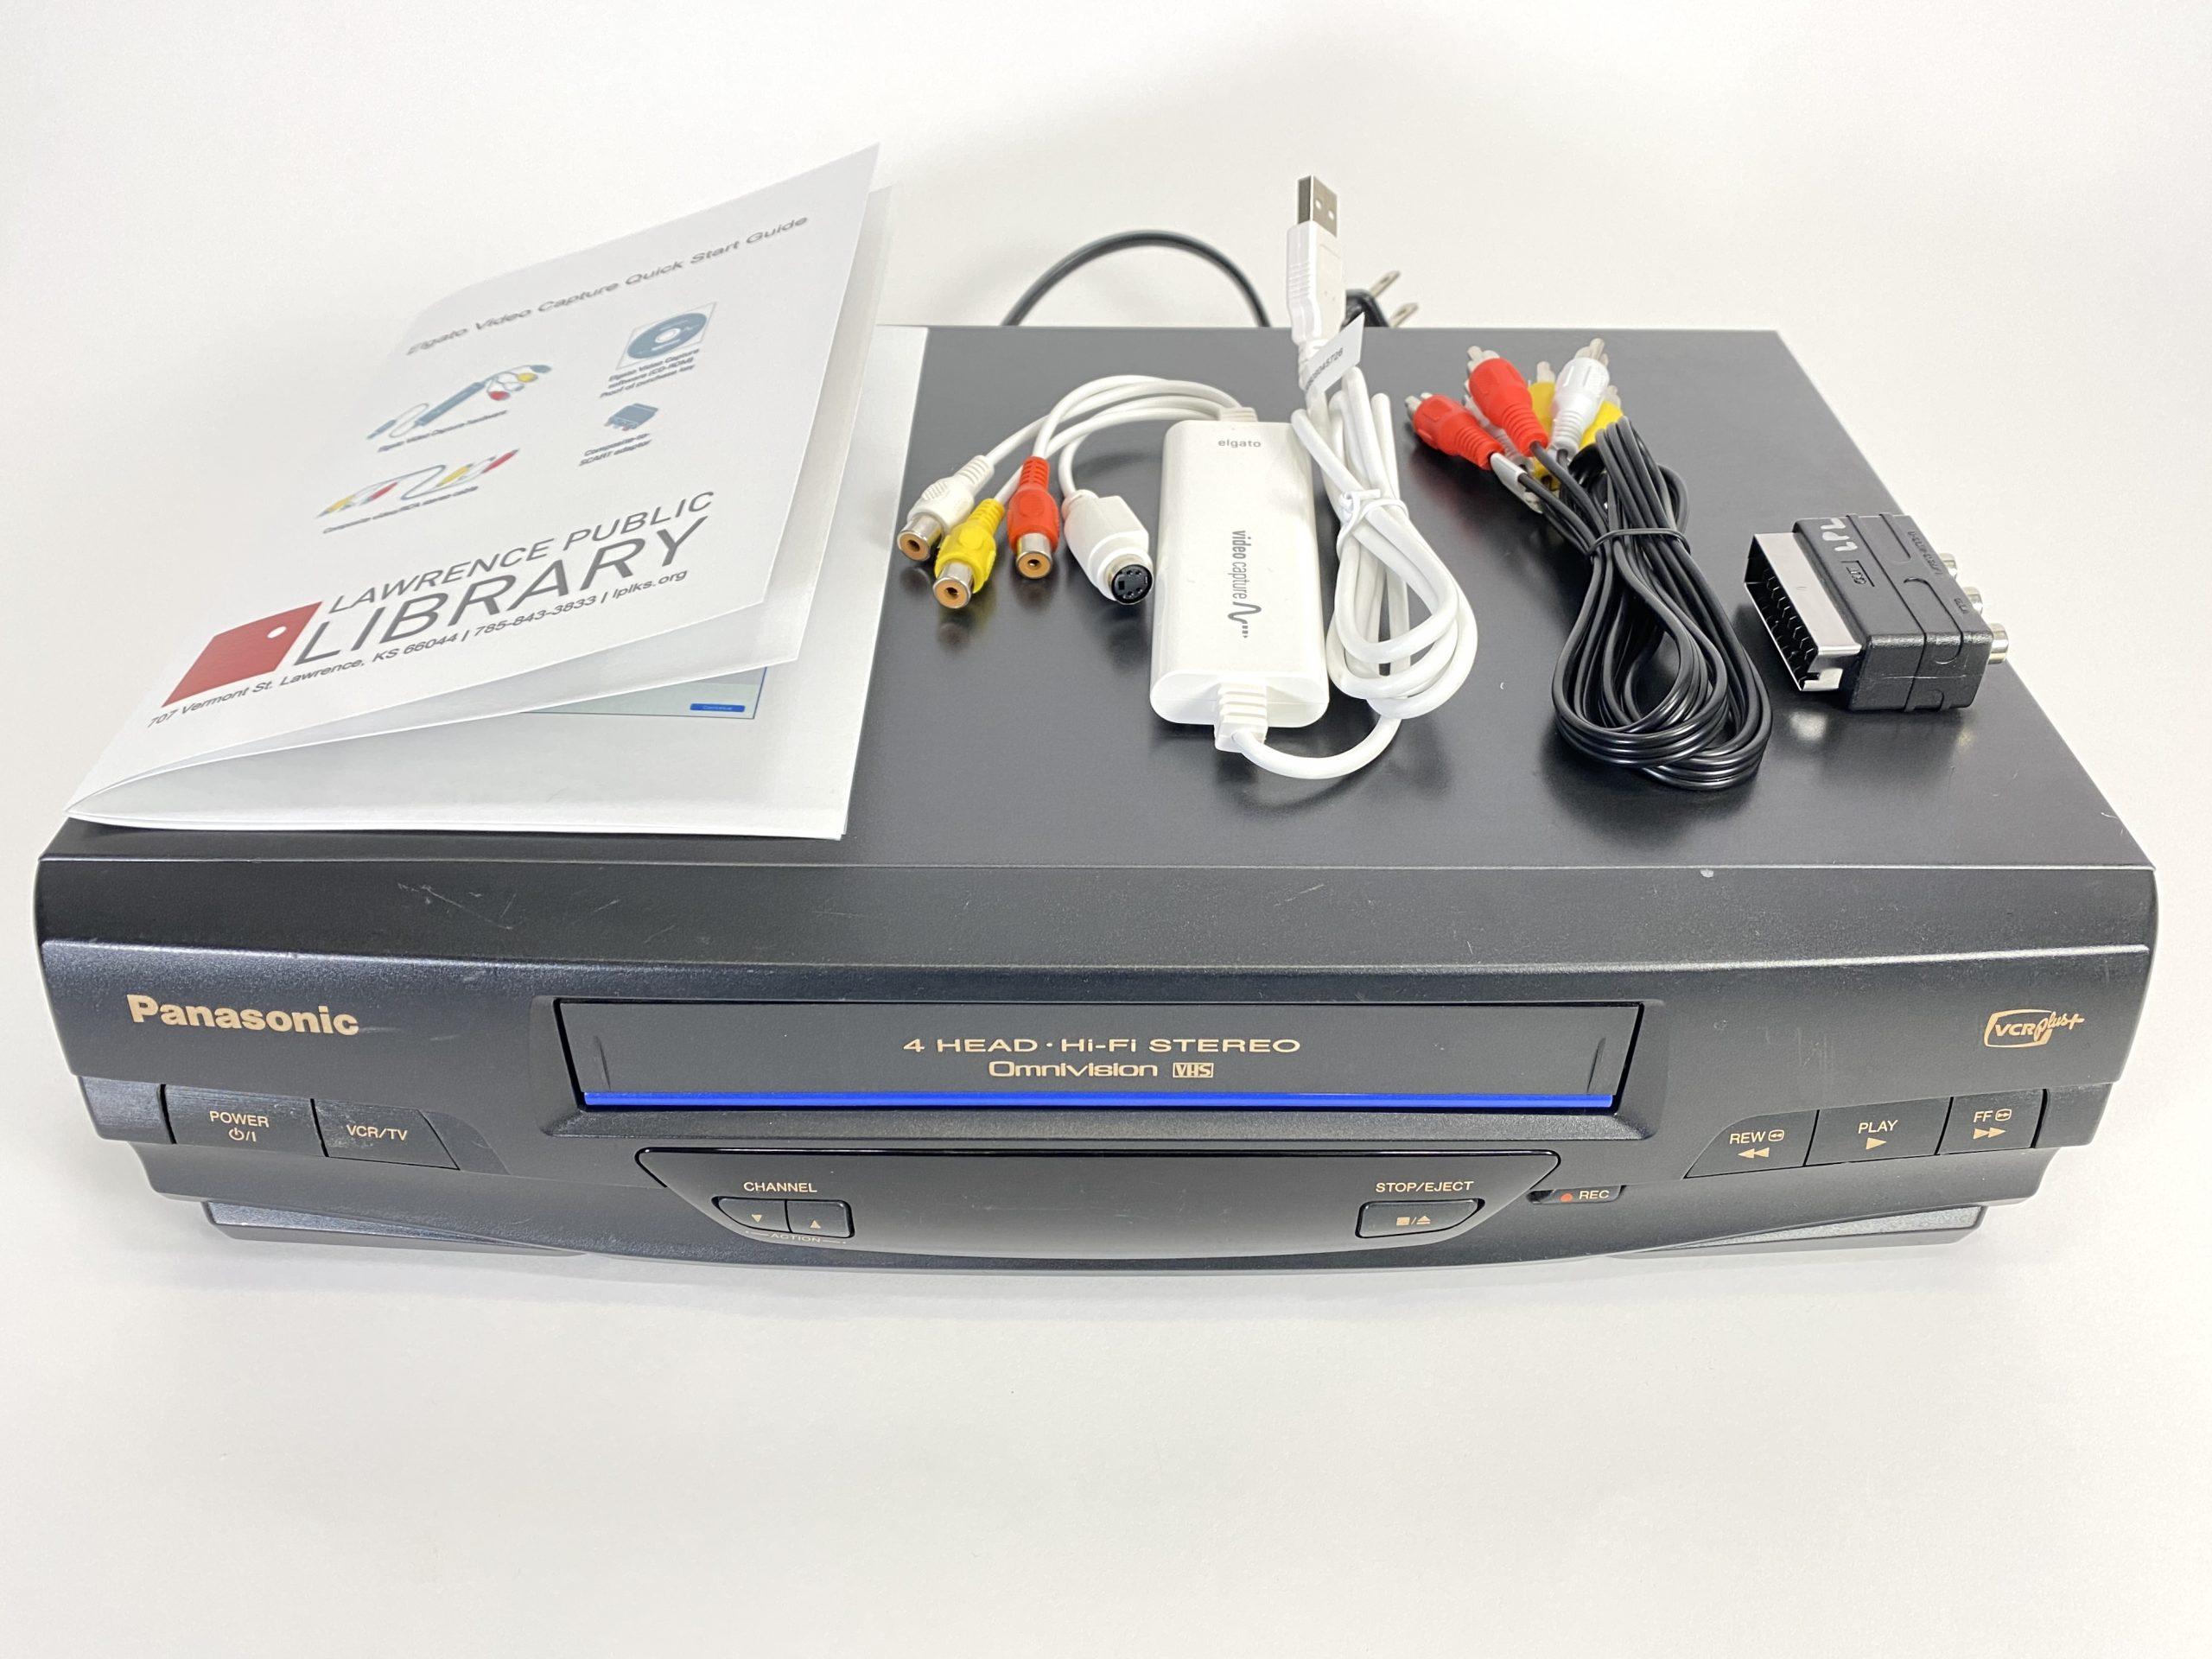 VHS Digitization Kit